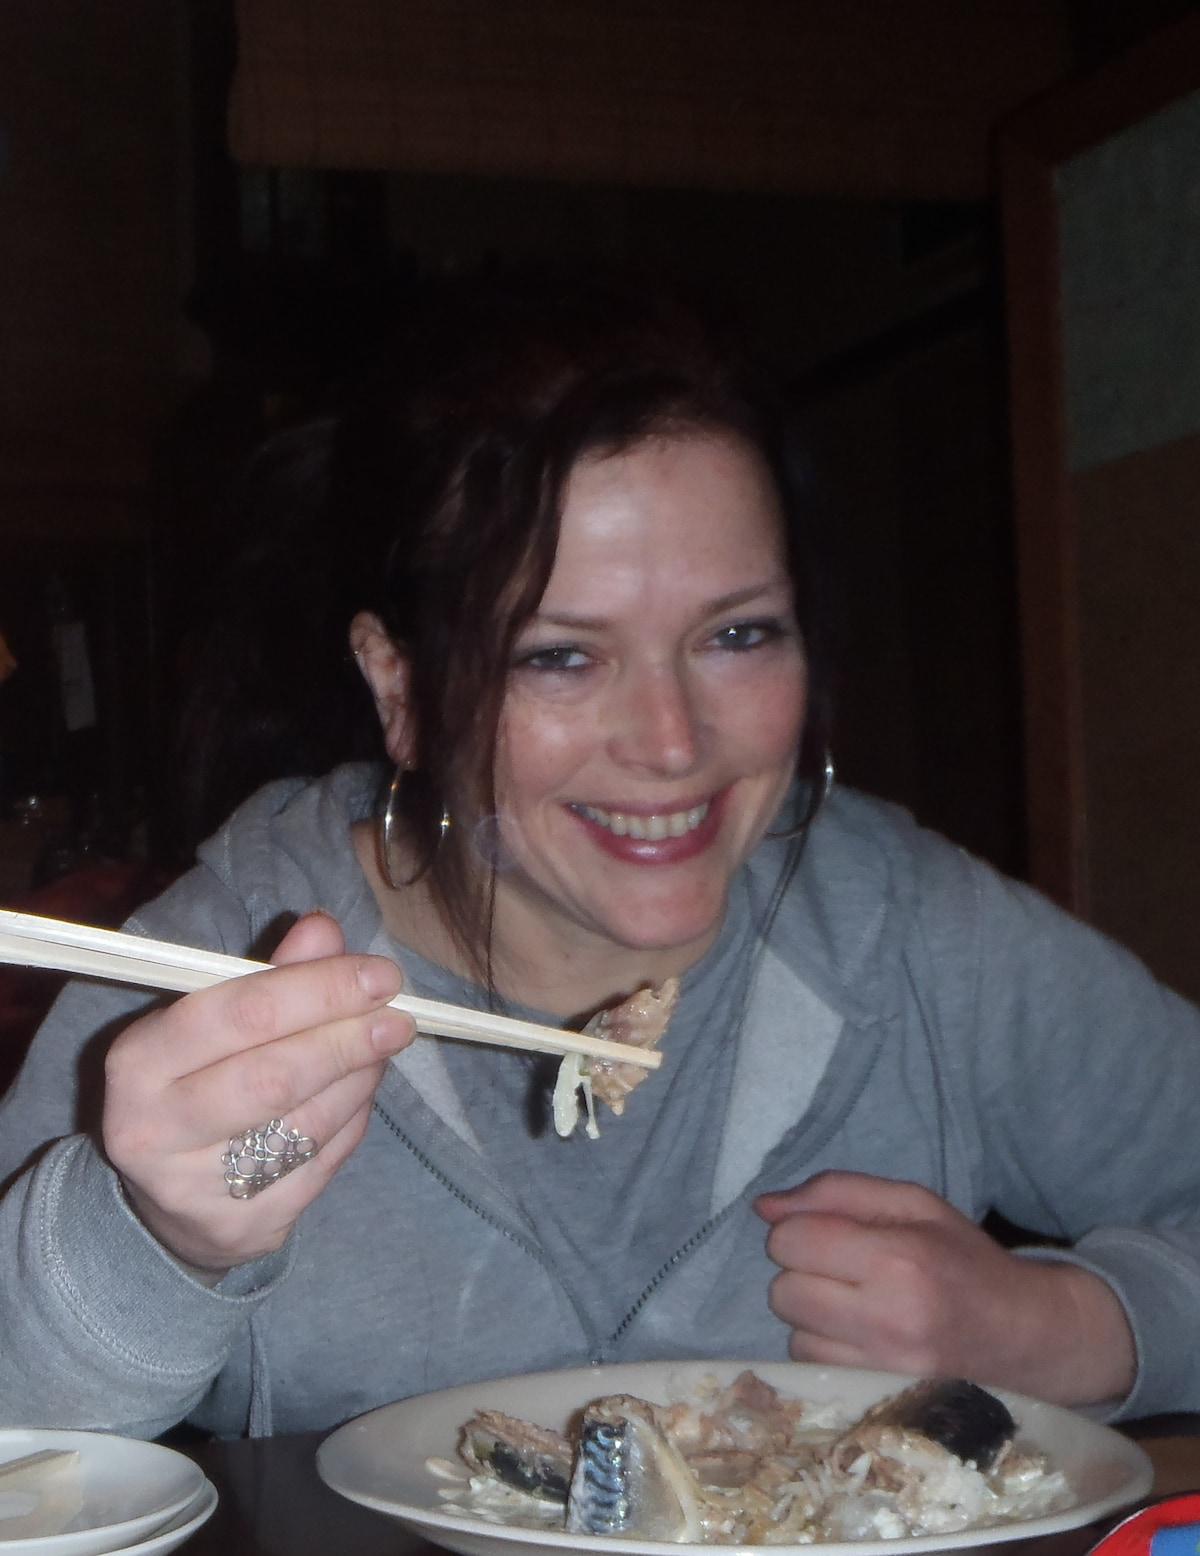 Rachel From Salford, United Kingdom